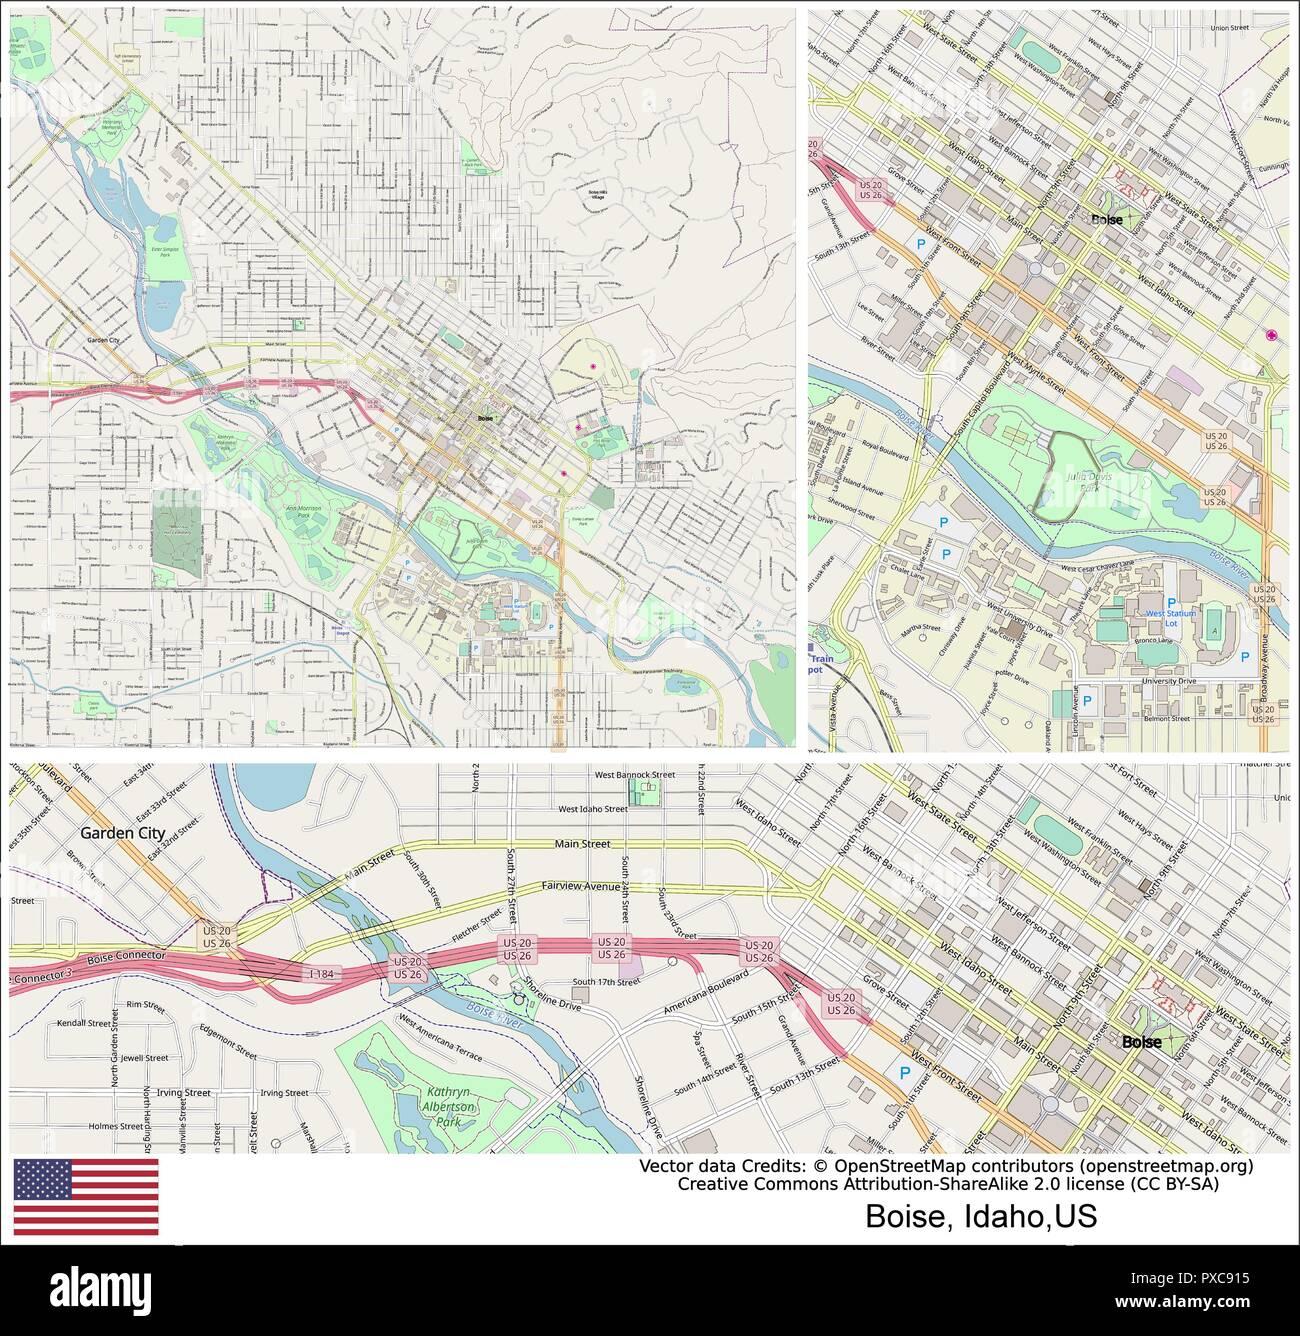 Boise, Idaho, USA, Ada County, Boise, Boise, Nampa, Meridian, Boise on